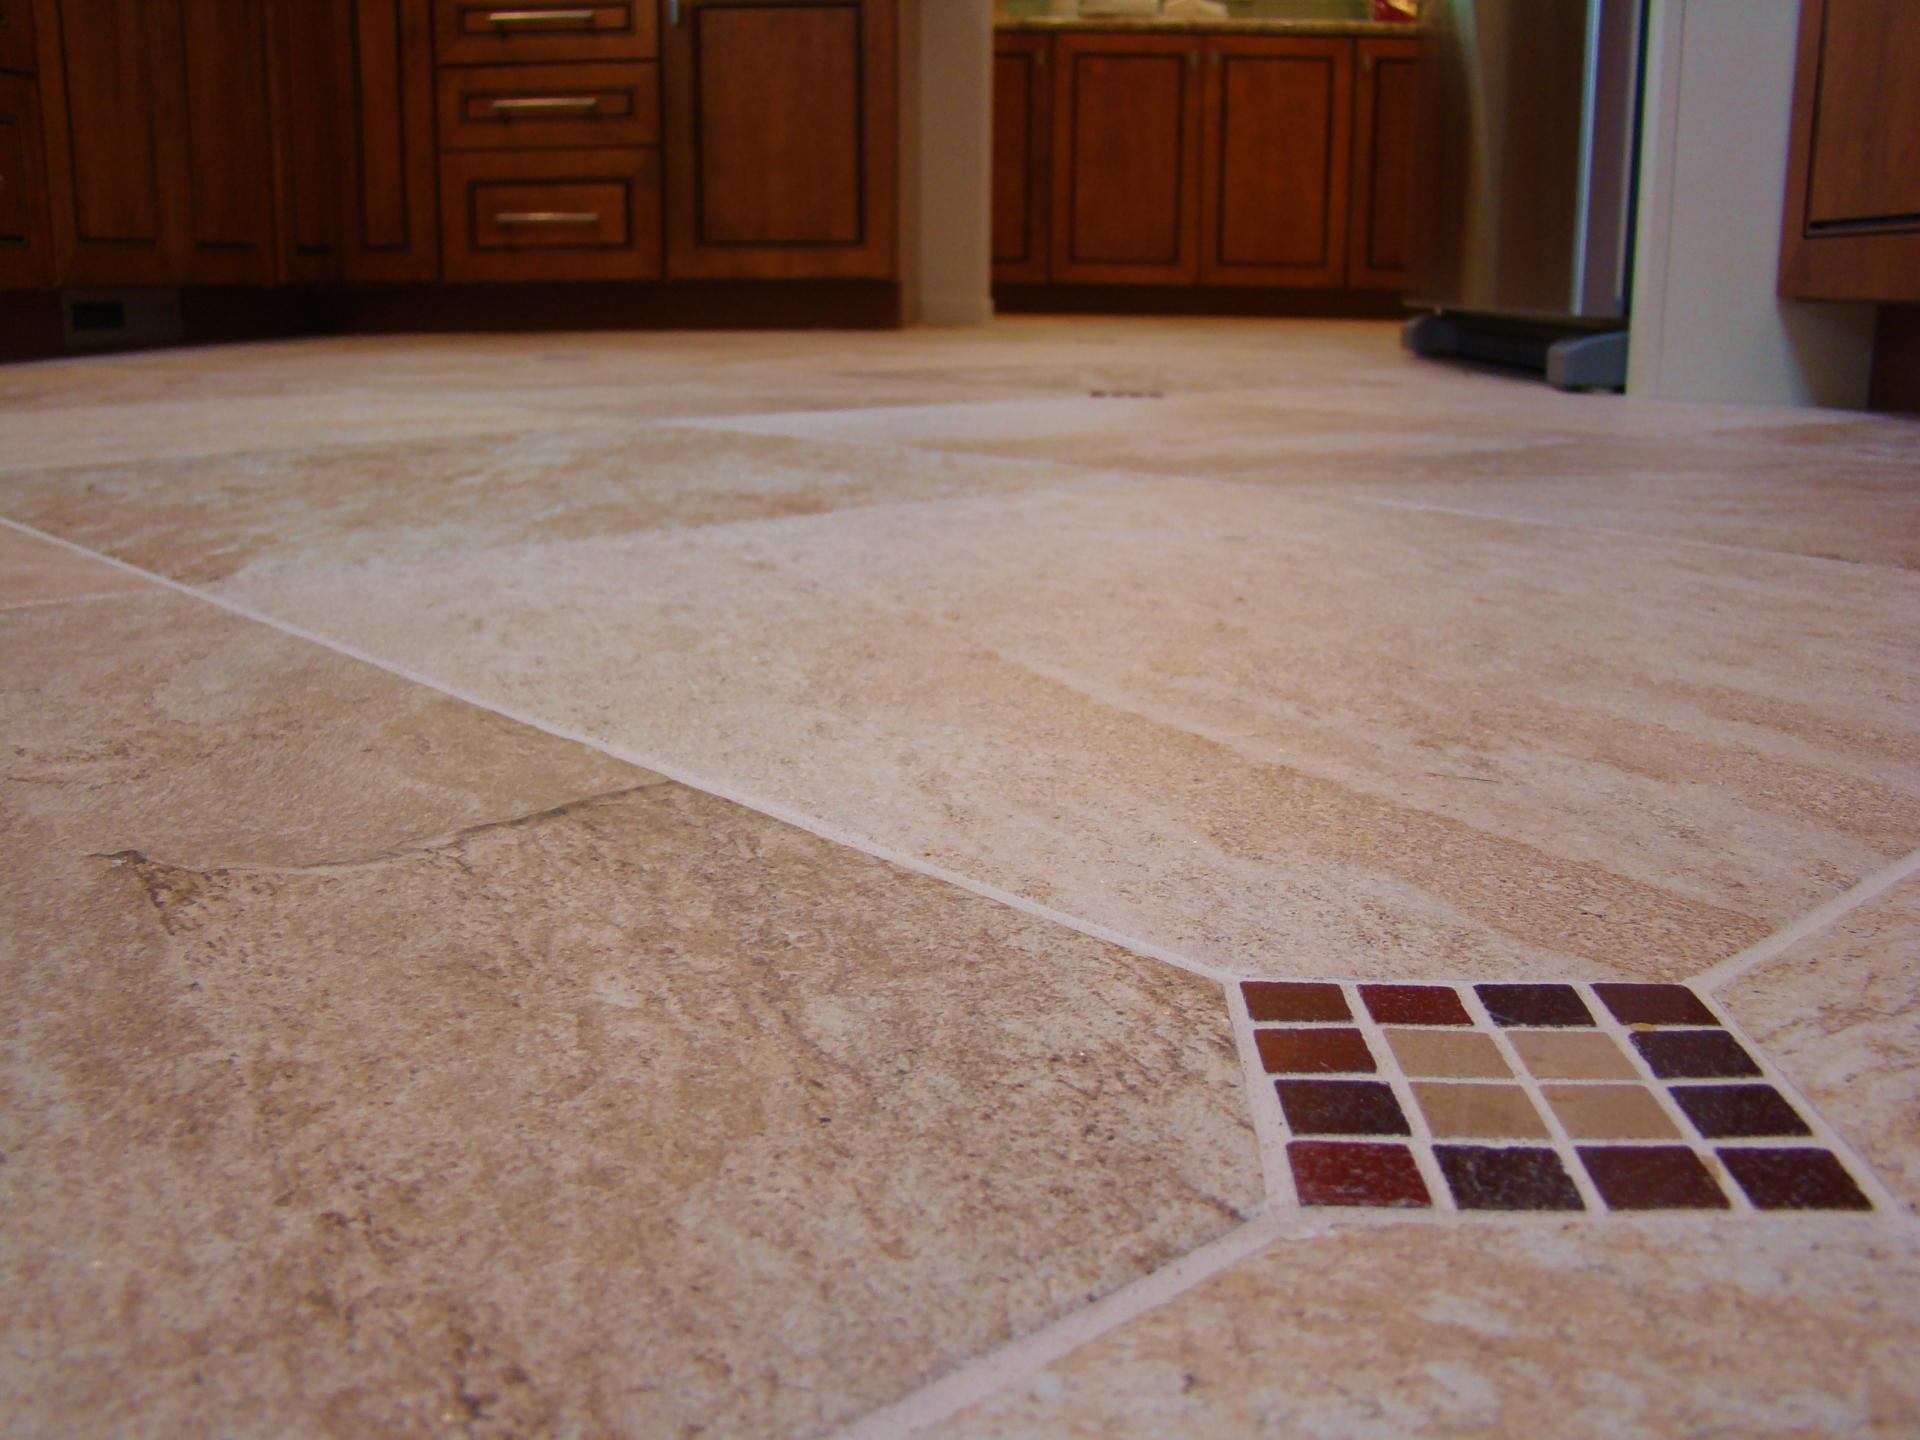 Fiorito Interior Design, interior design, remodel, kitchen, light and dark cabinetry, custom tile floor, marble mosaic